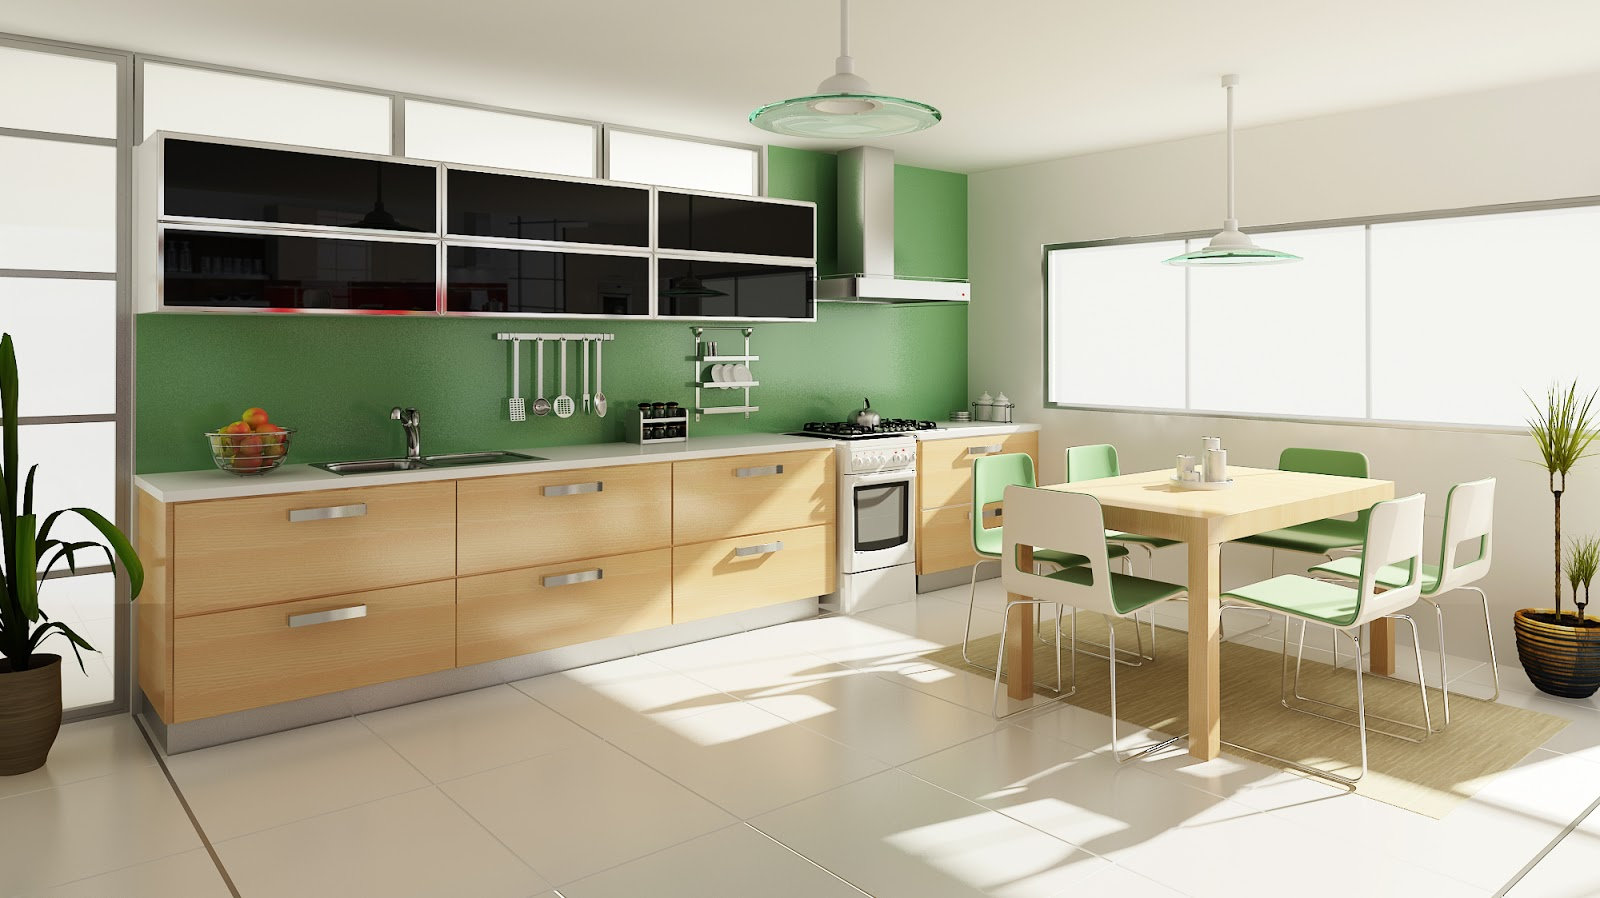 Arquitectura en im genes 3d dise o de interiores cocinas for Diseno cocinas 3d gratis espanol